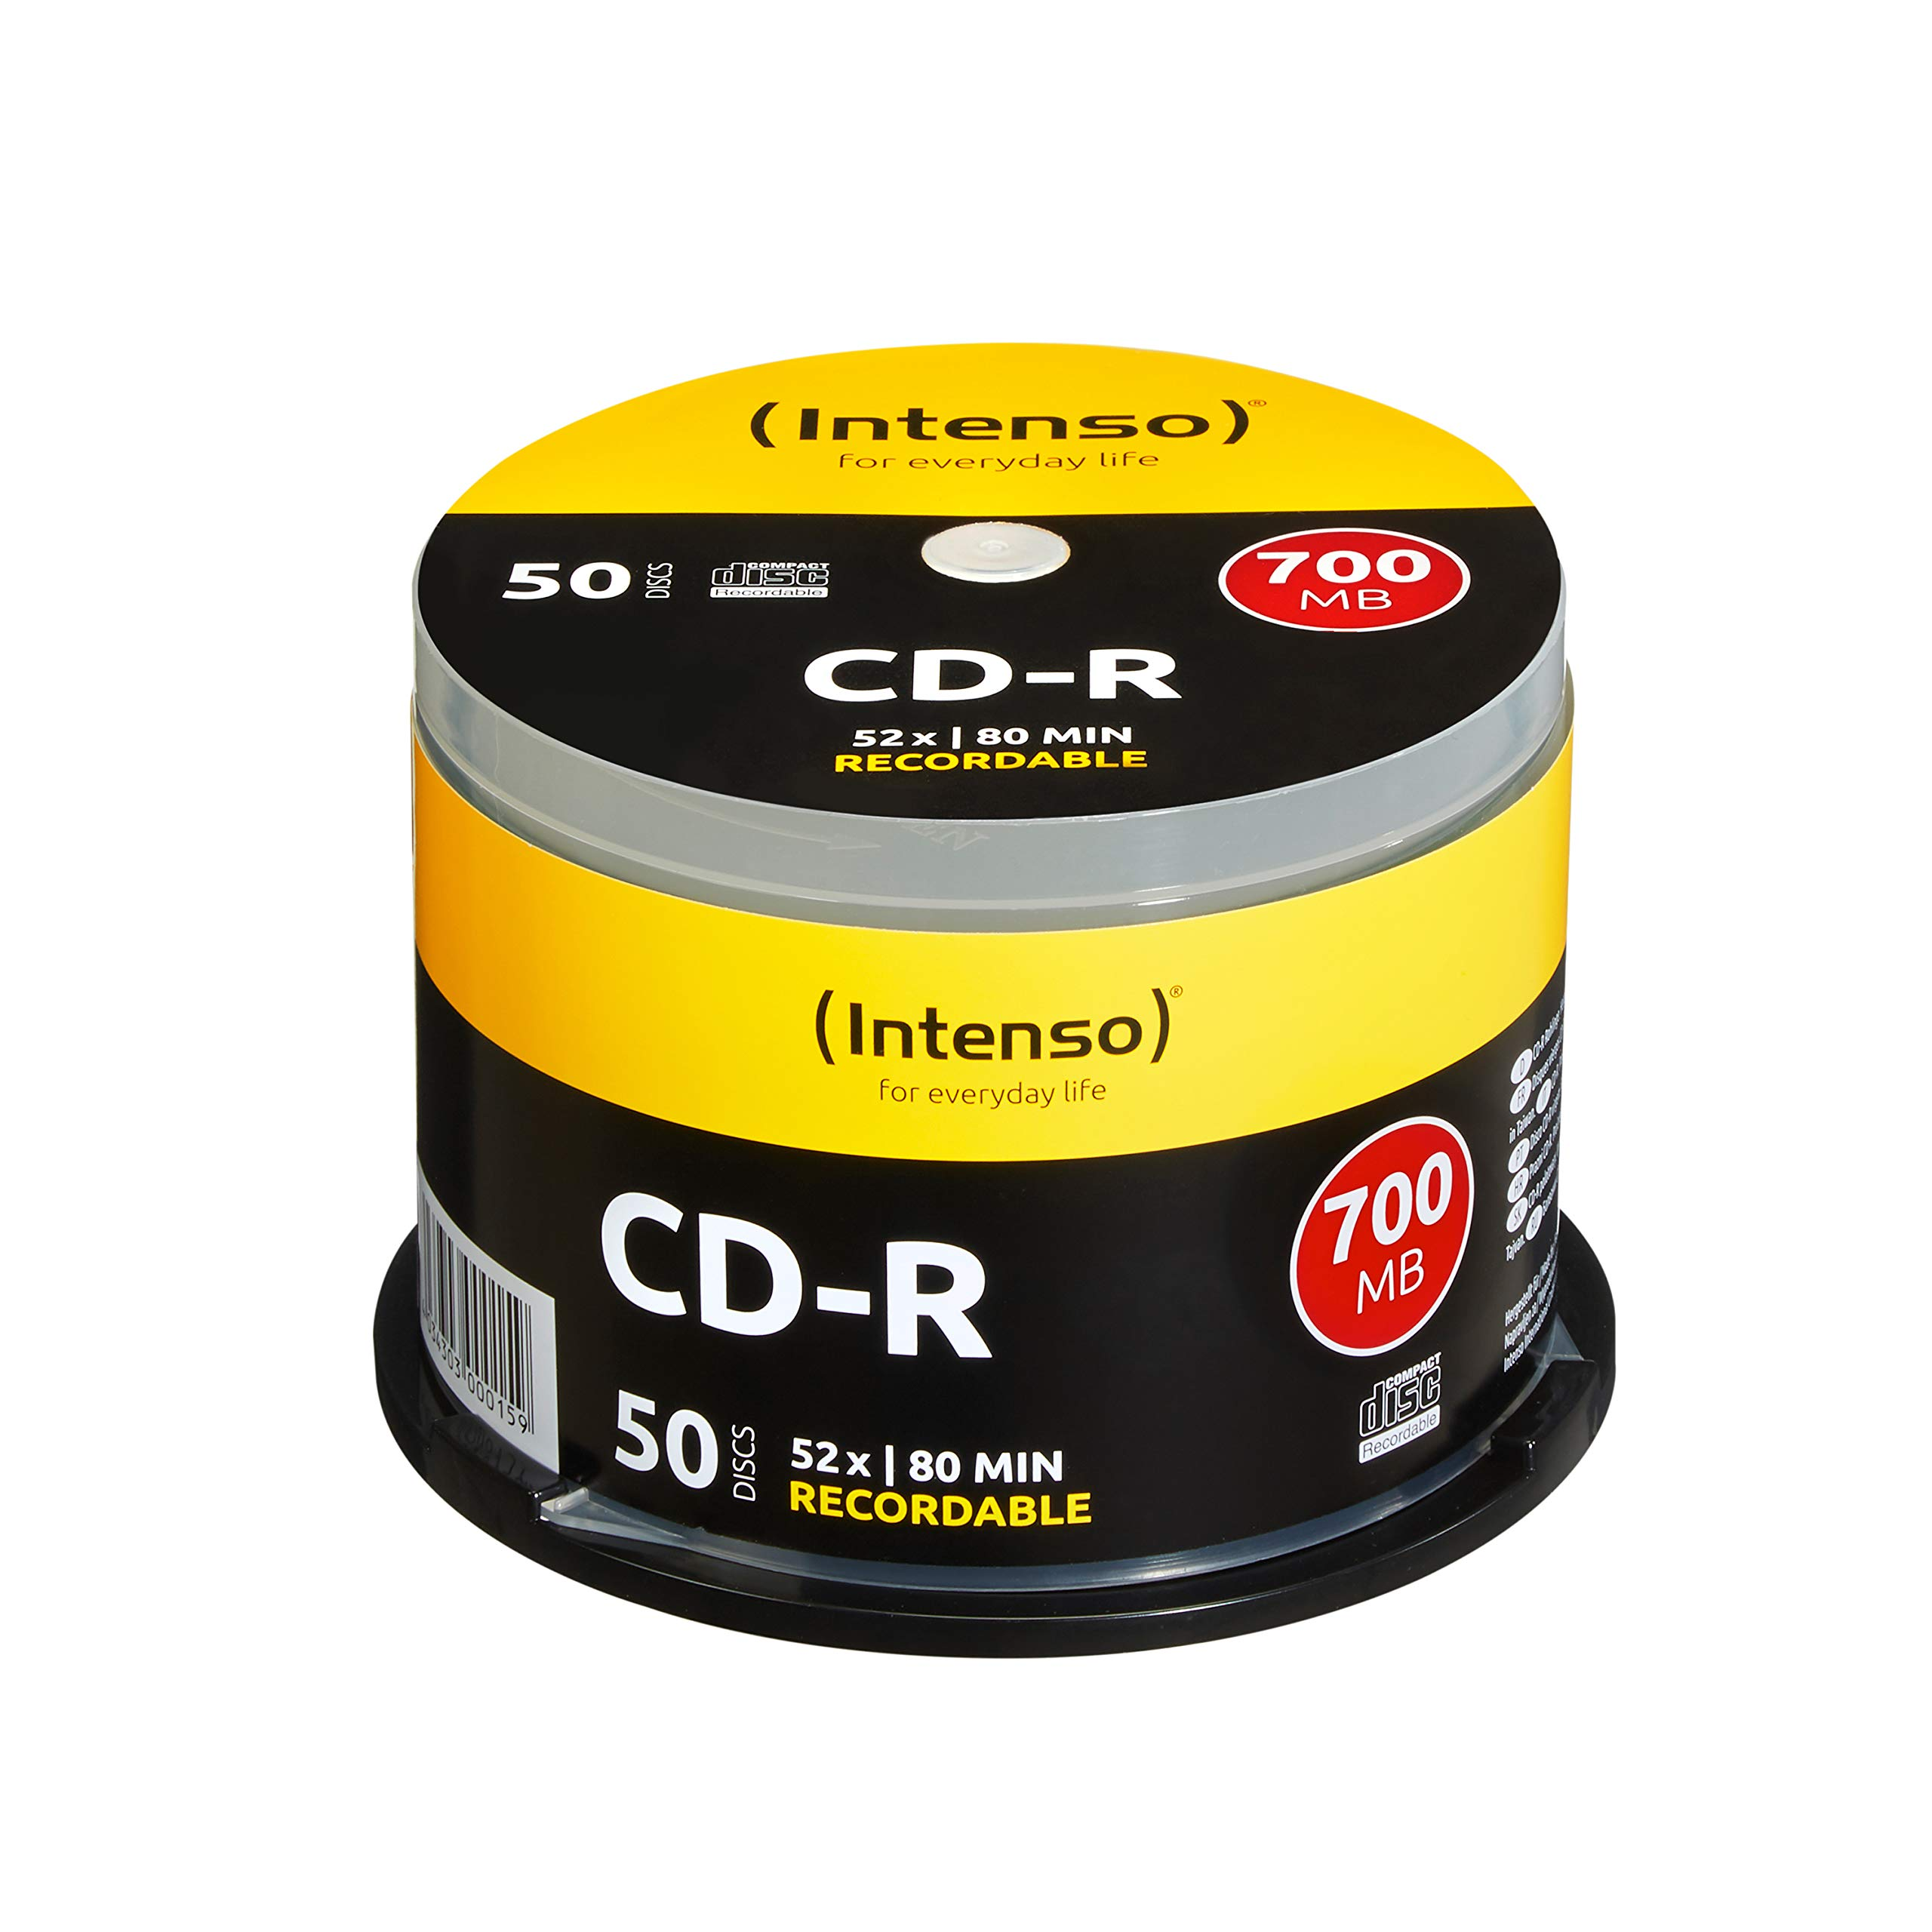 Intenso 1001125 - Pack de CD-R vírgenes (700 MB, 80 Minutos, 52x ...